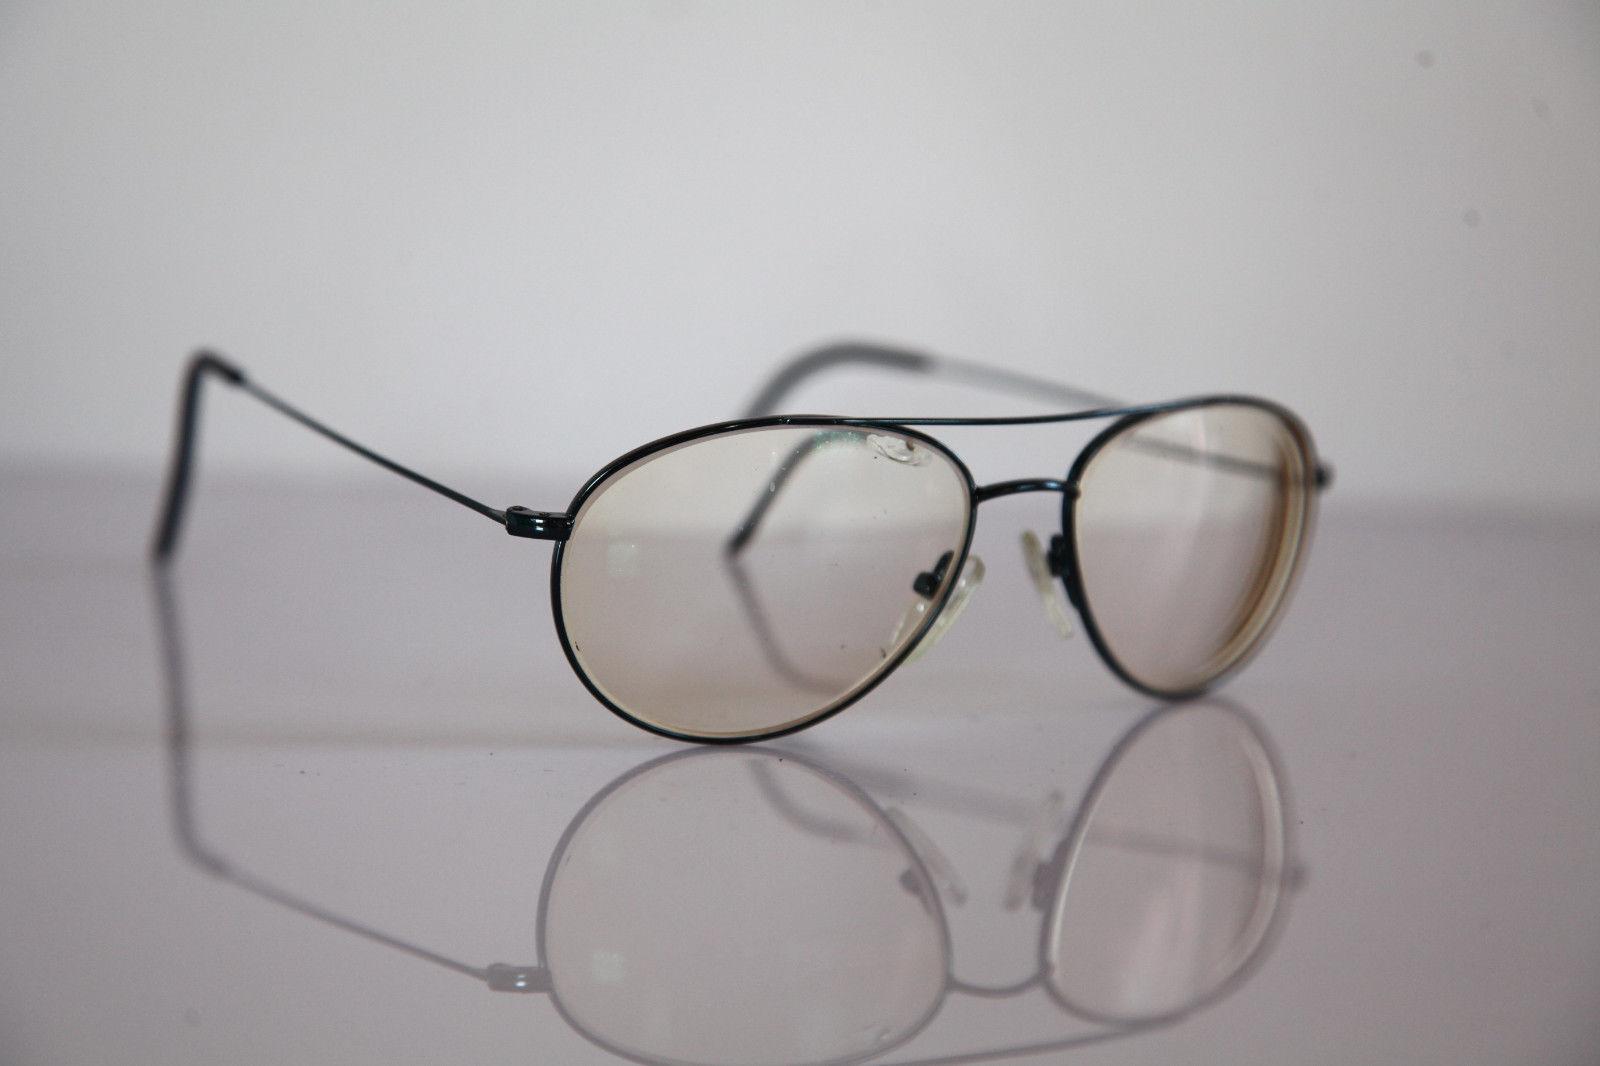 Eyewear, Metallic Blue Aviator Frame,  Prescription Lenses. RX- Able